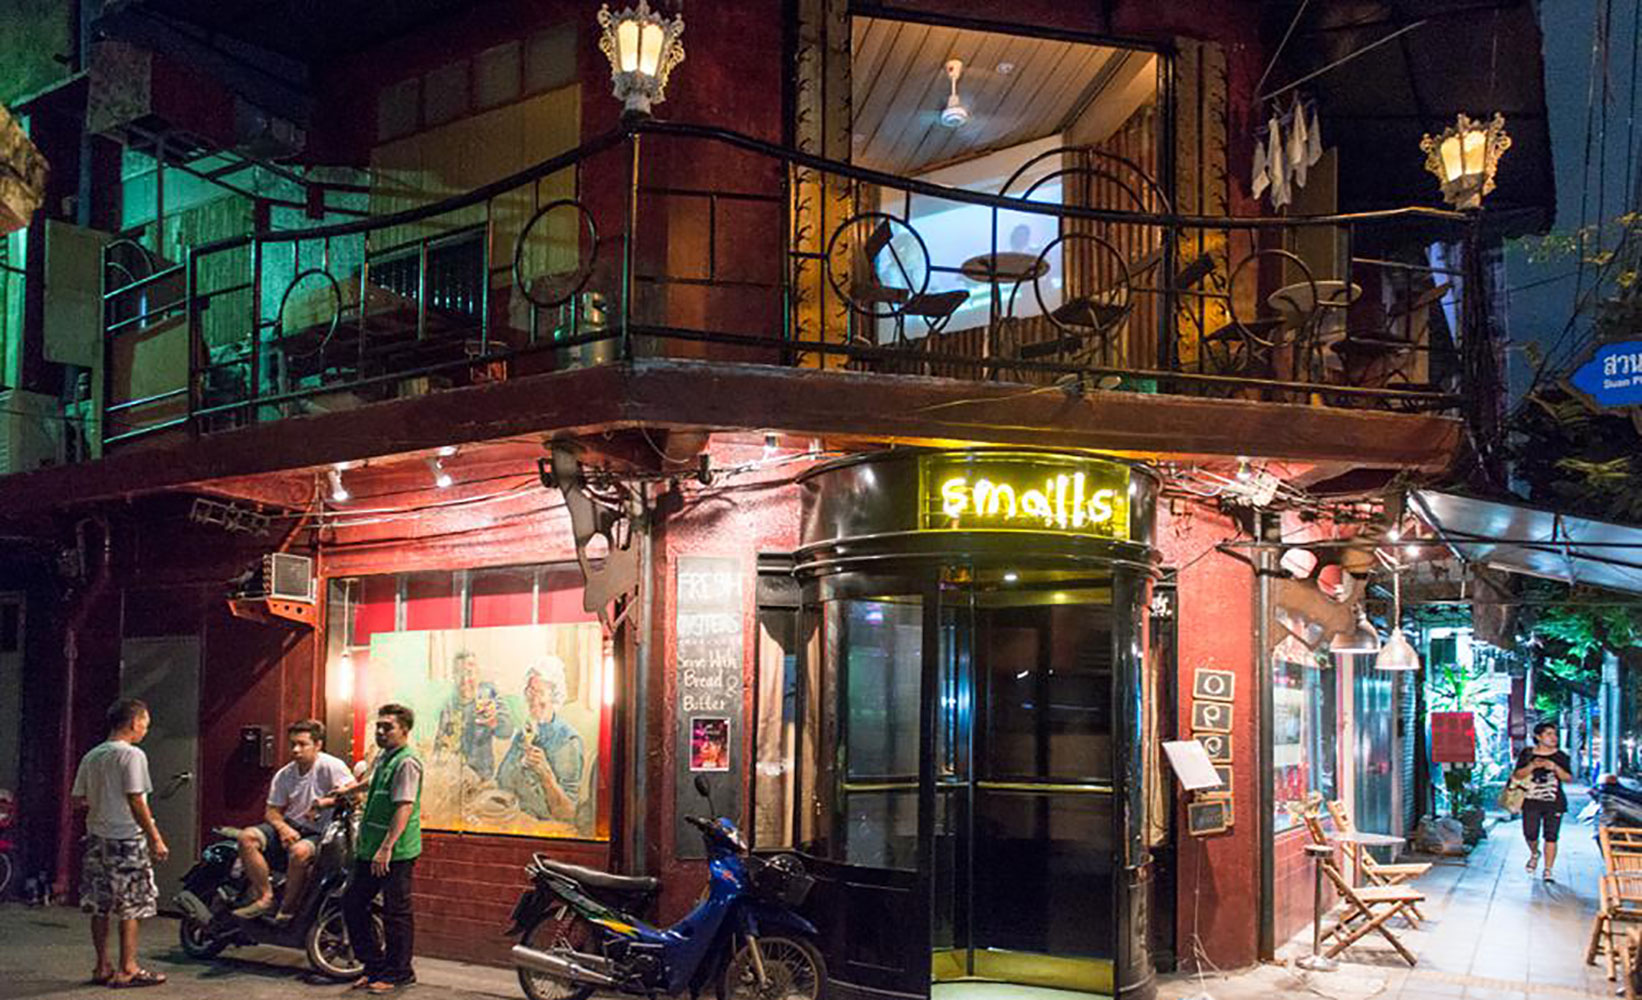 Retro bar filming location in Bangkok Thailand